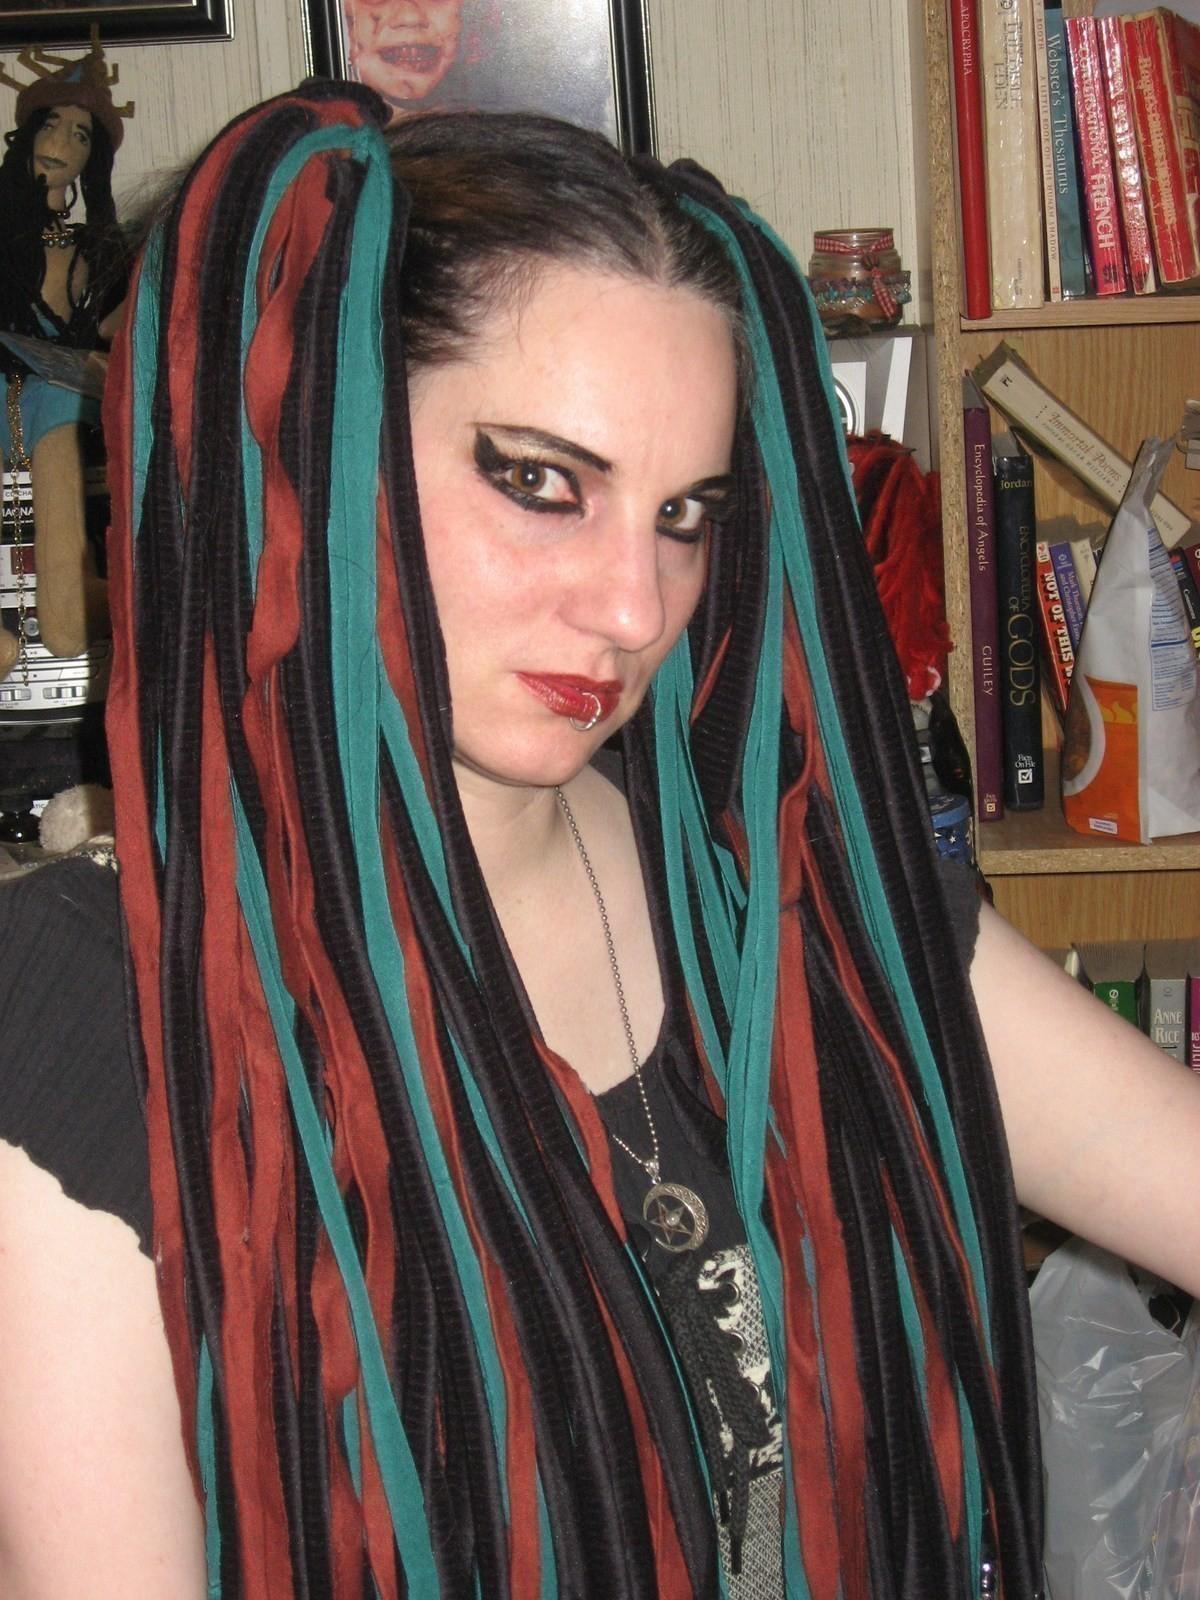 Hair Weaves A Dreadlock Fall No Sew On Cut Out Keep